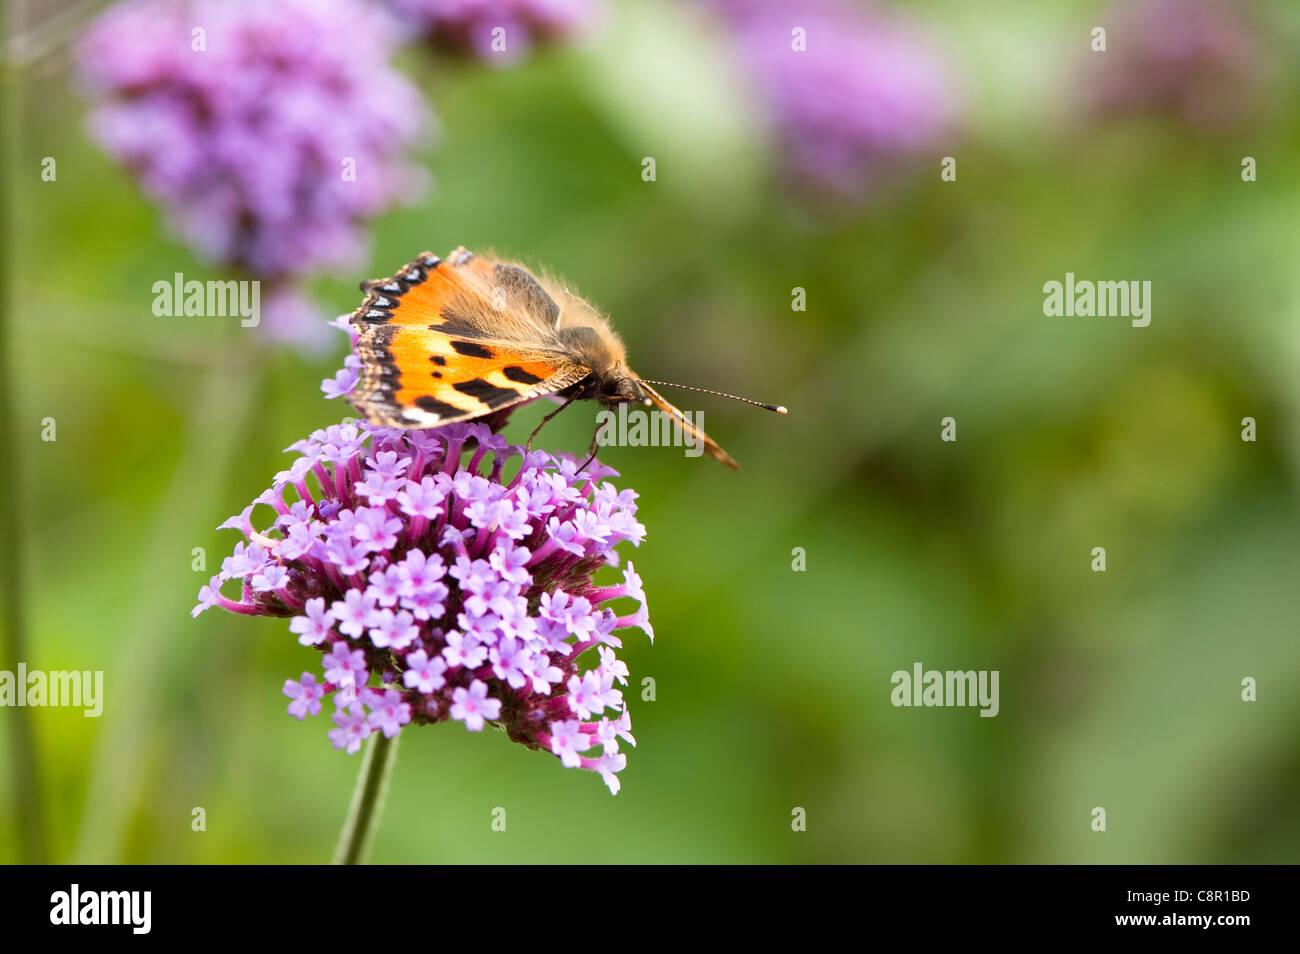 Small Tortoiseshell Butterfly, Aglais urticae, feeding on Verbena bonariensis - Stock Image